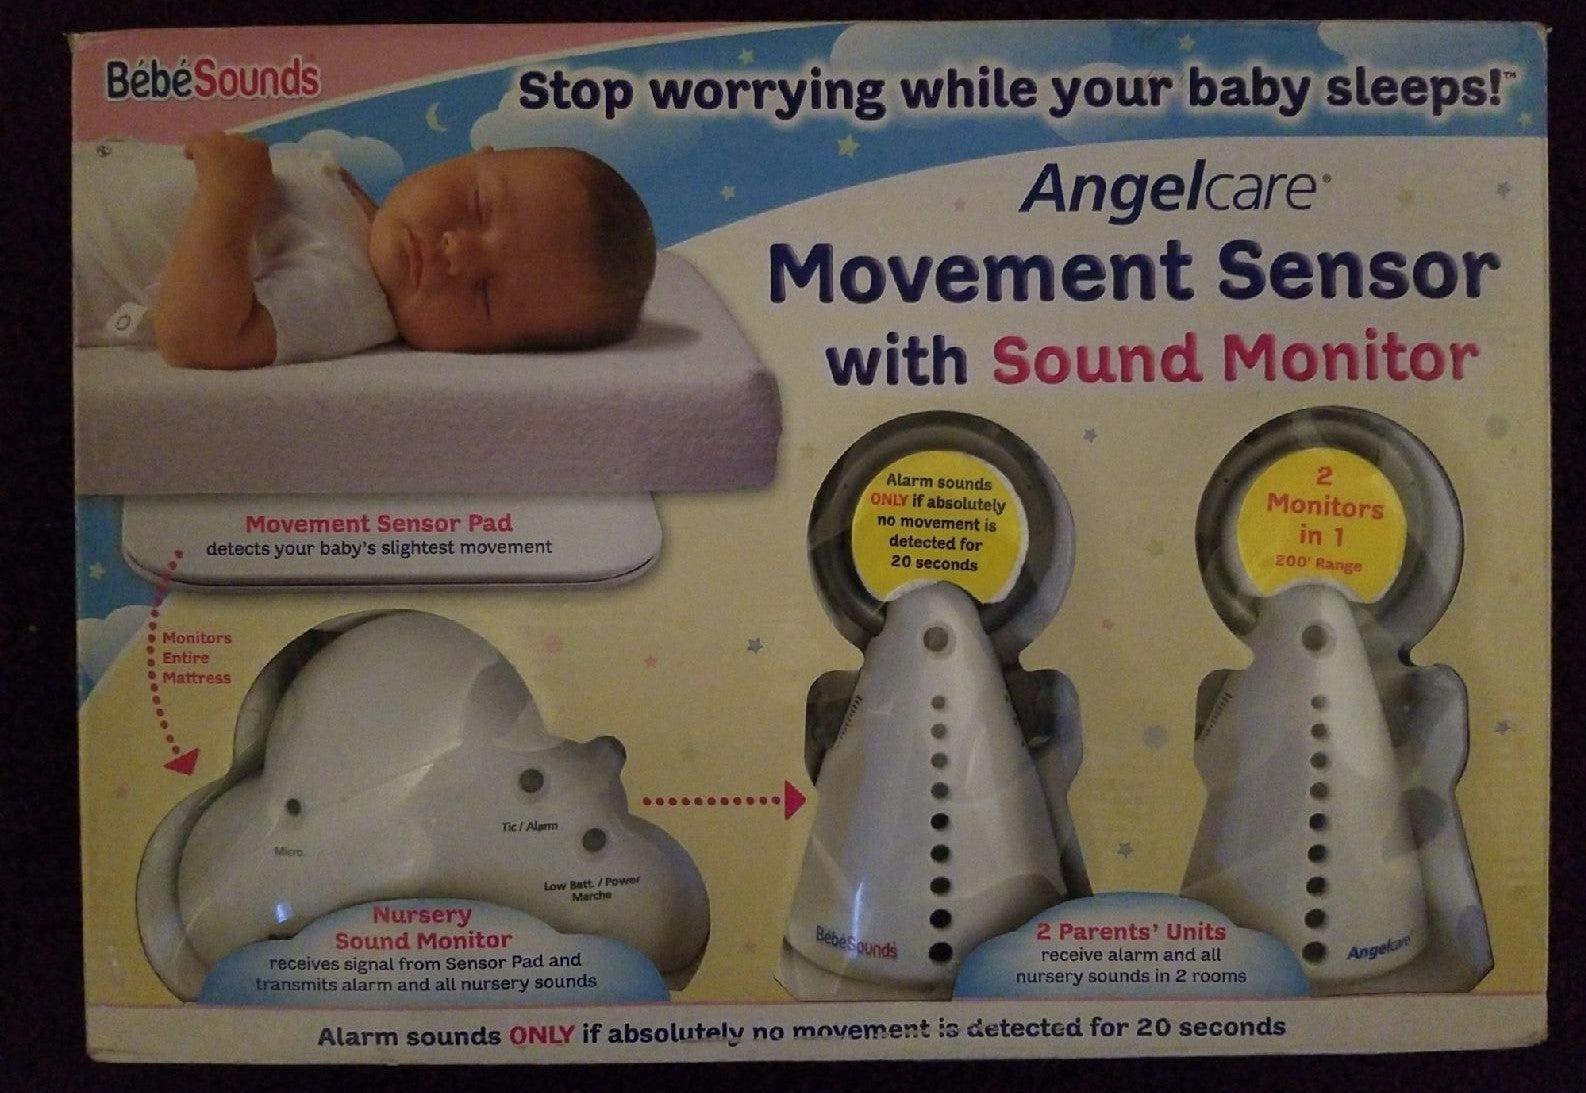 AngelCare Movement Sensor w/ Sound Monit